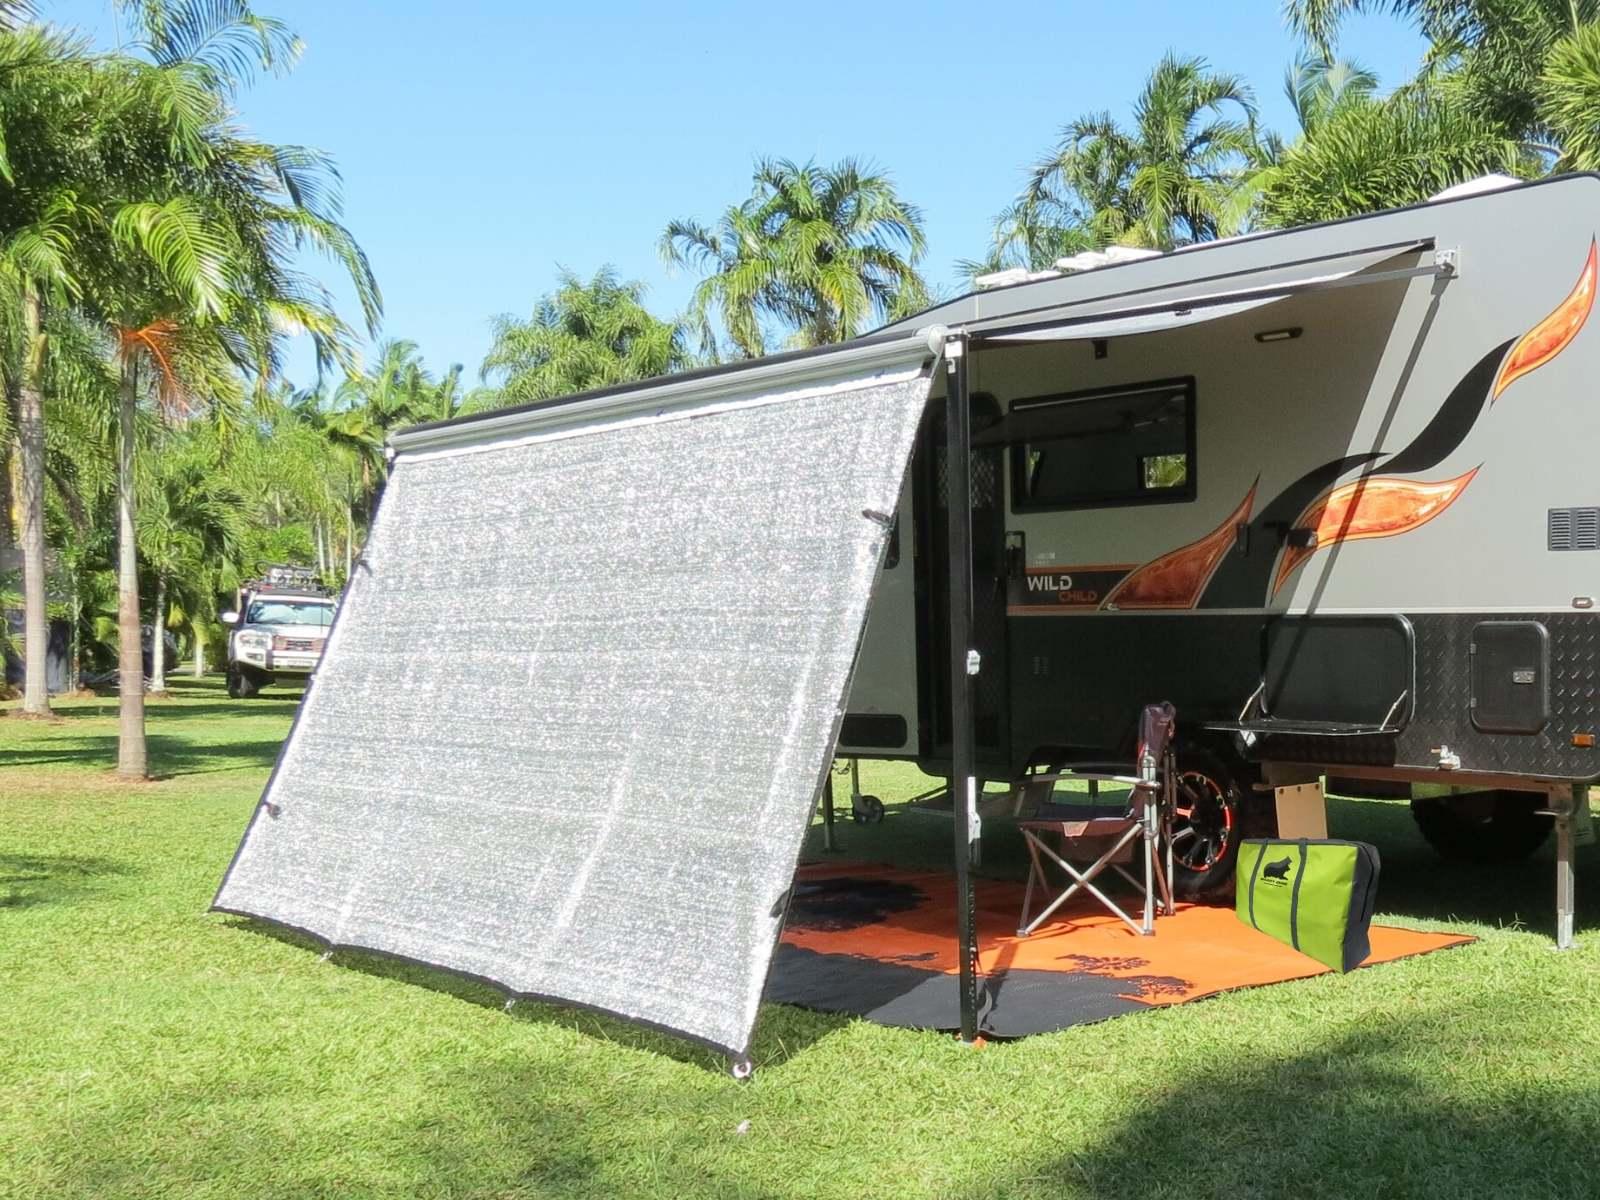 Caravan Awning shade